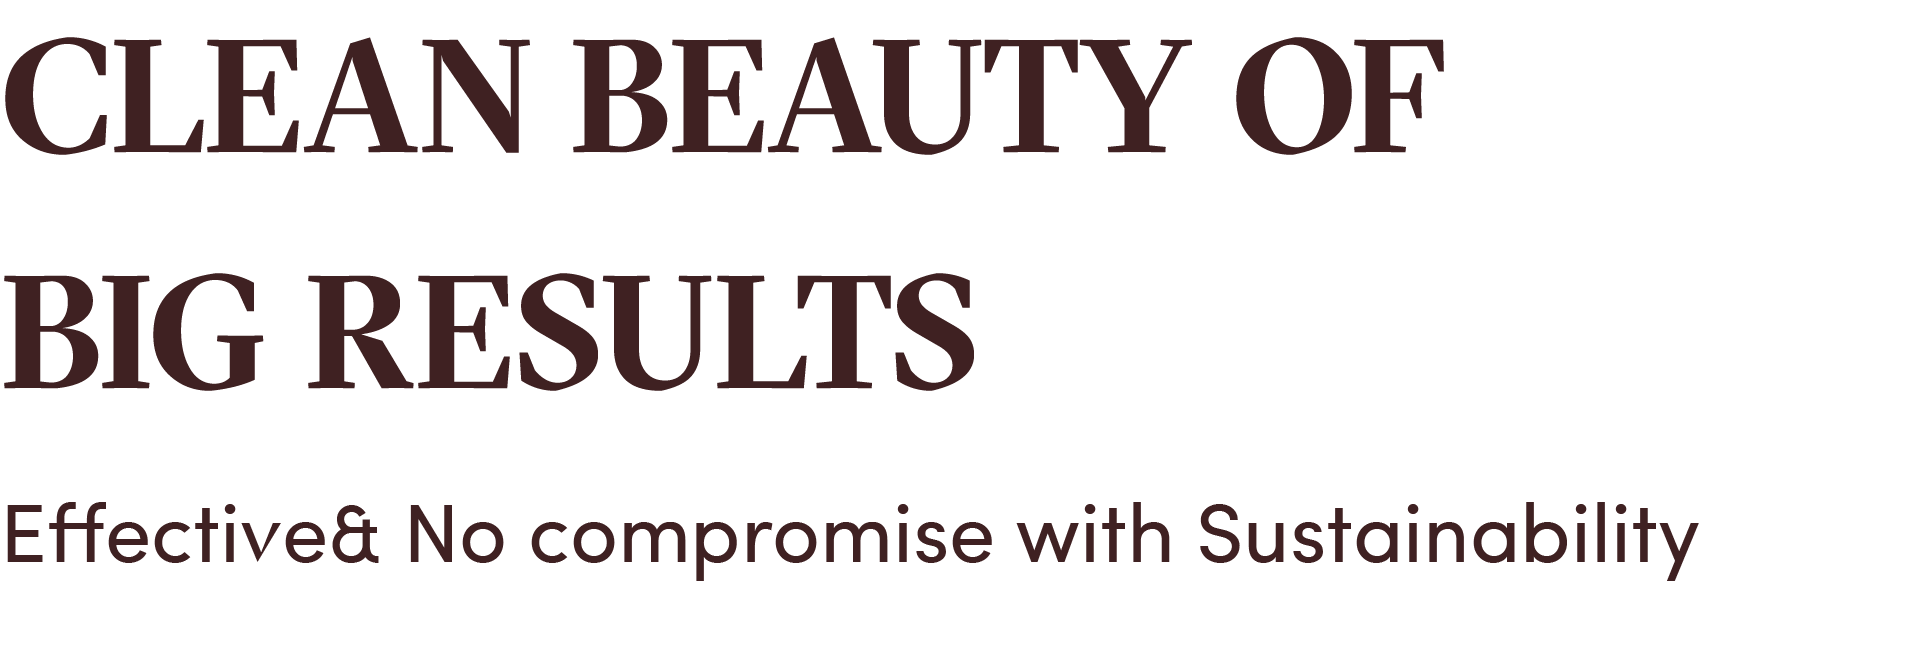 Botanic Pretti5 Clean Beauty